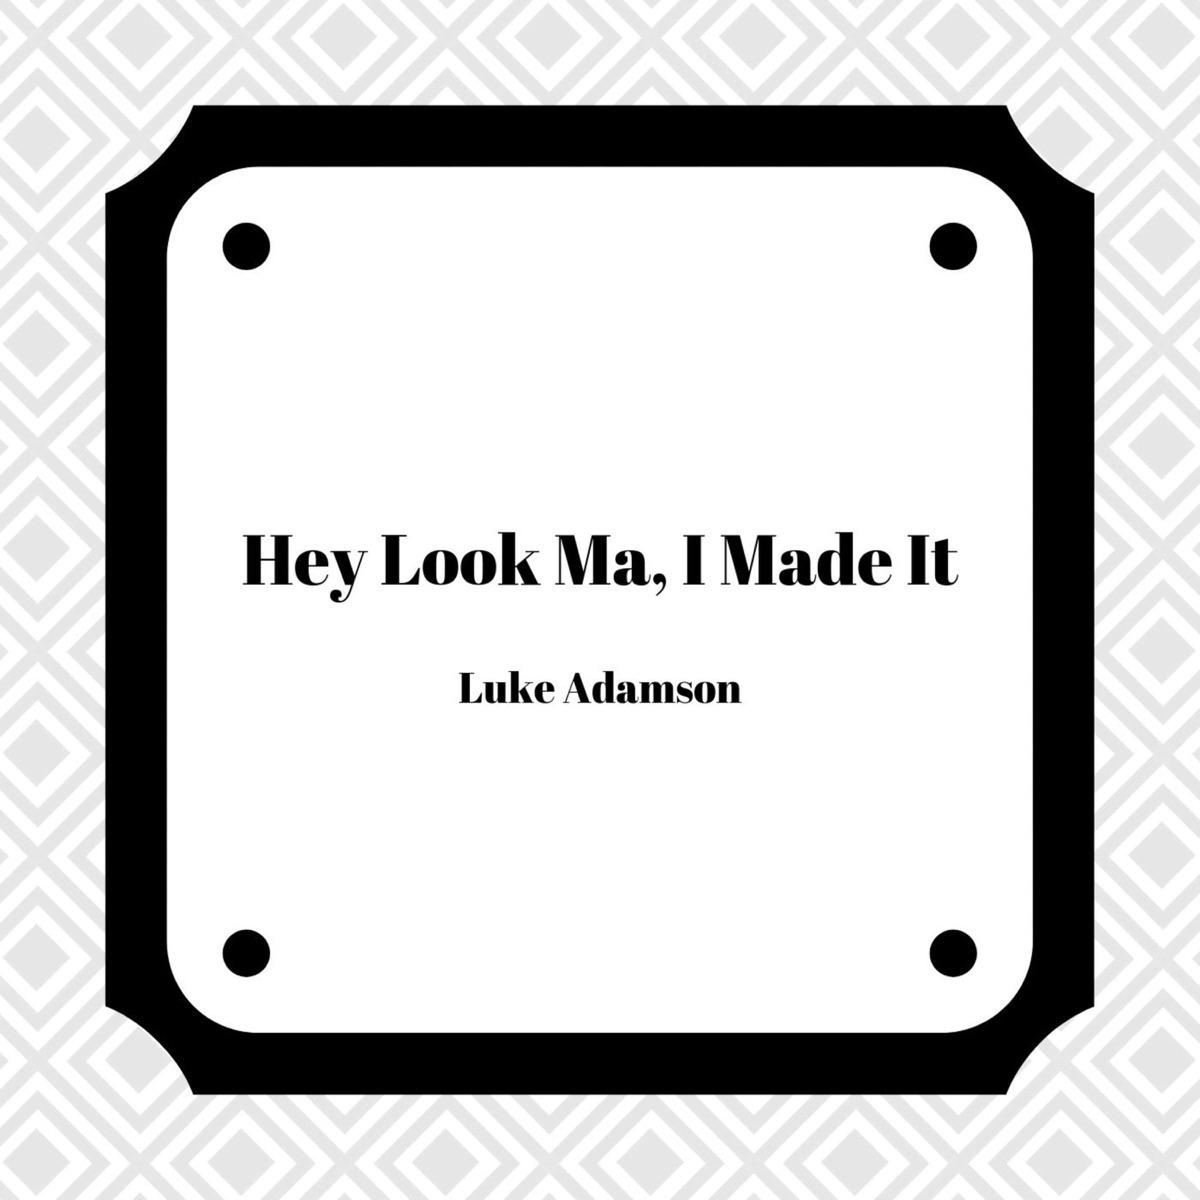 Hey Look Ma I Made It - Single Luke Adamson CD cover